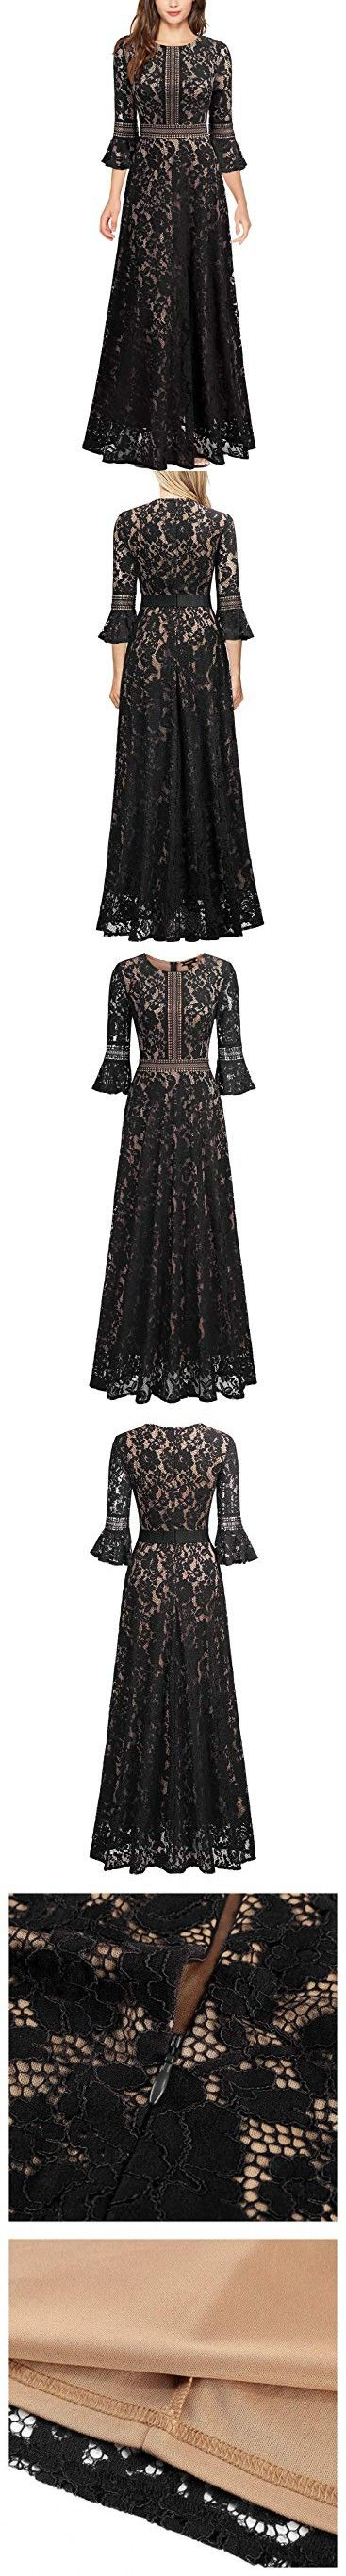 4753f5596 MissMay Women s Vintage Full Lace Contrast Bell Sleeve Formal Long Maxi  Dress